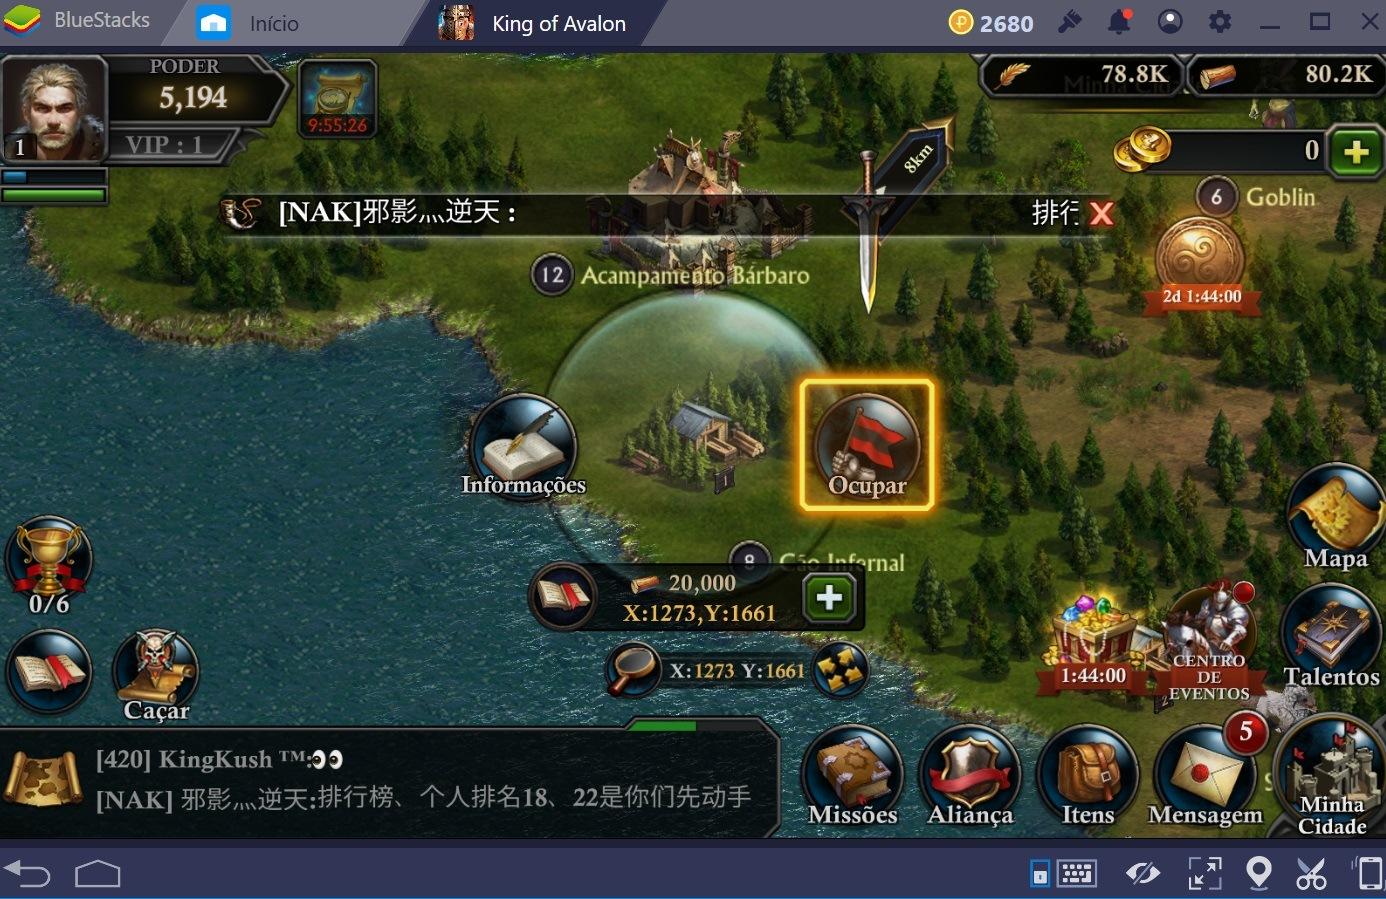 Guia de combate em King of Avalon: Dragon Warfare